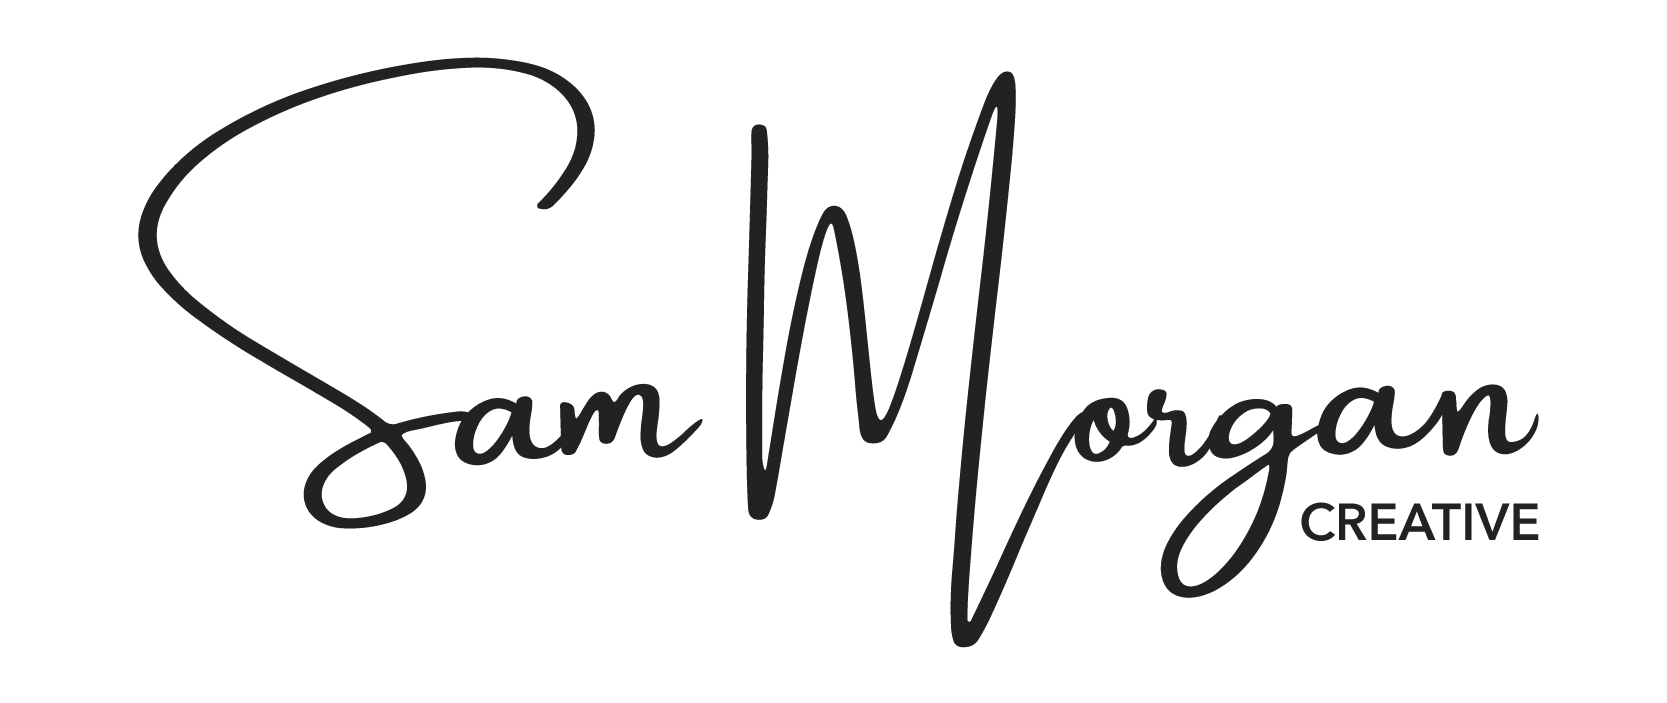 Sam Morgan Creative Logo Black-01